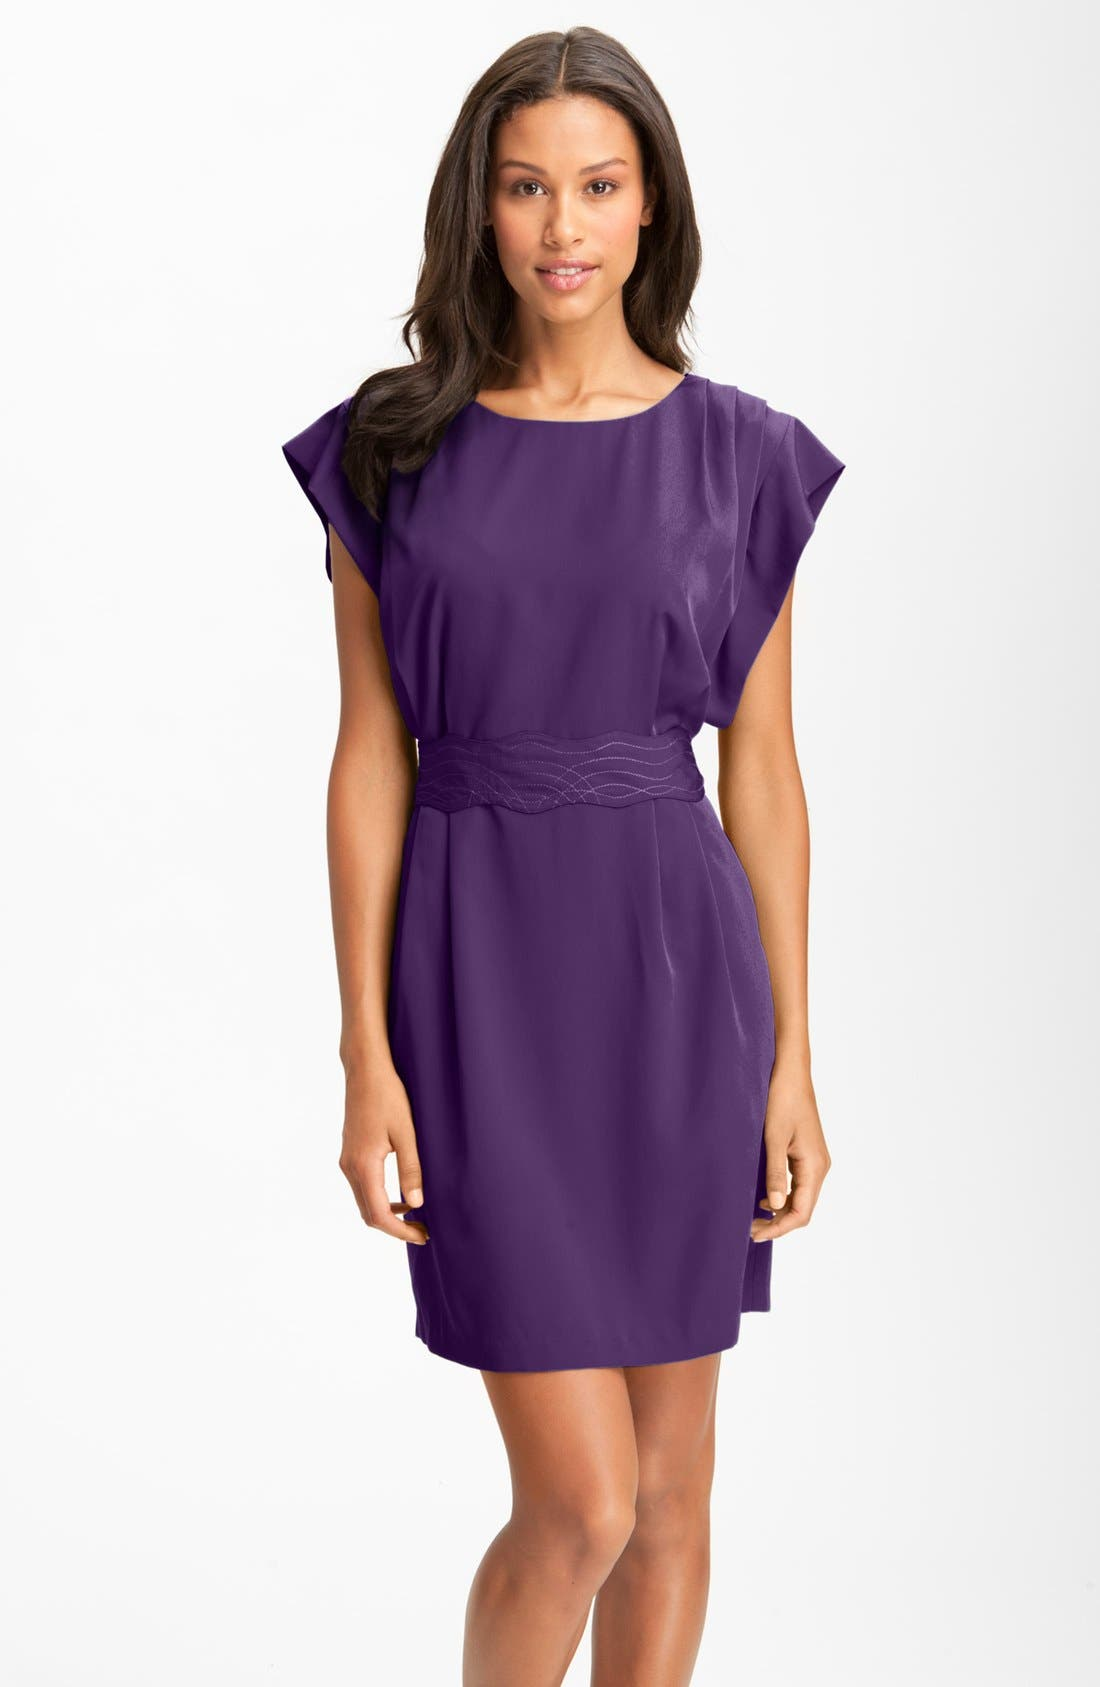 Alternate Image 1 Selected - Eliza J Drape Sleeve Sash Belt Dress